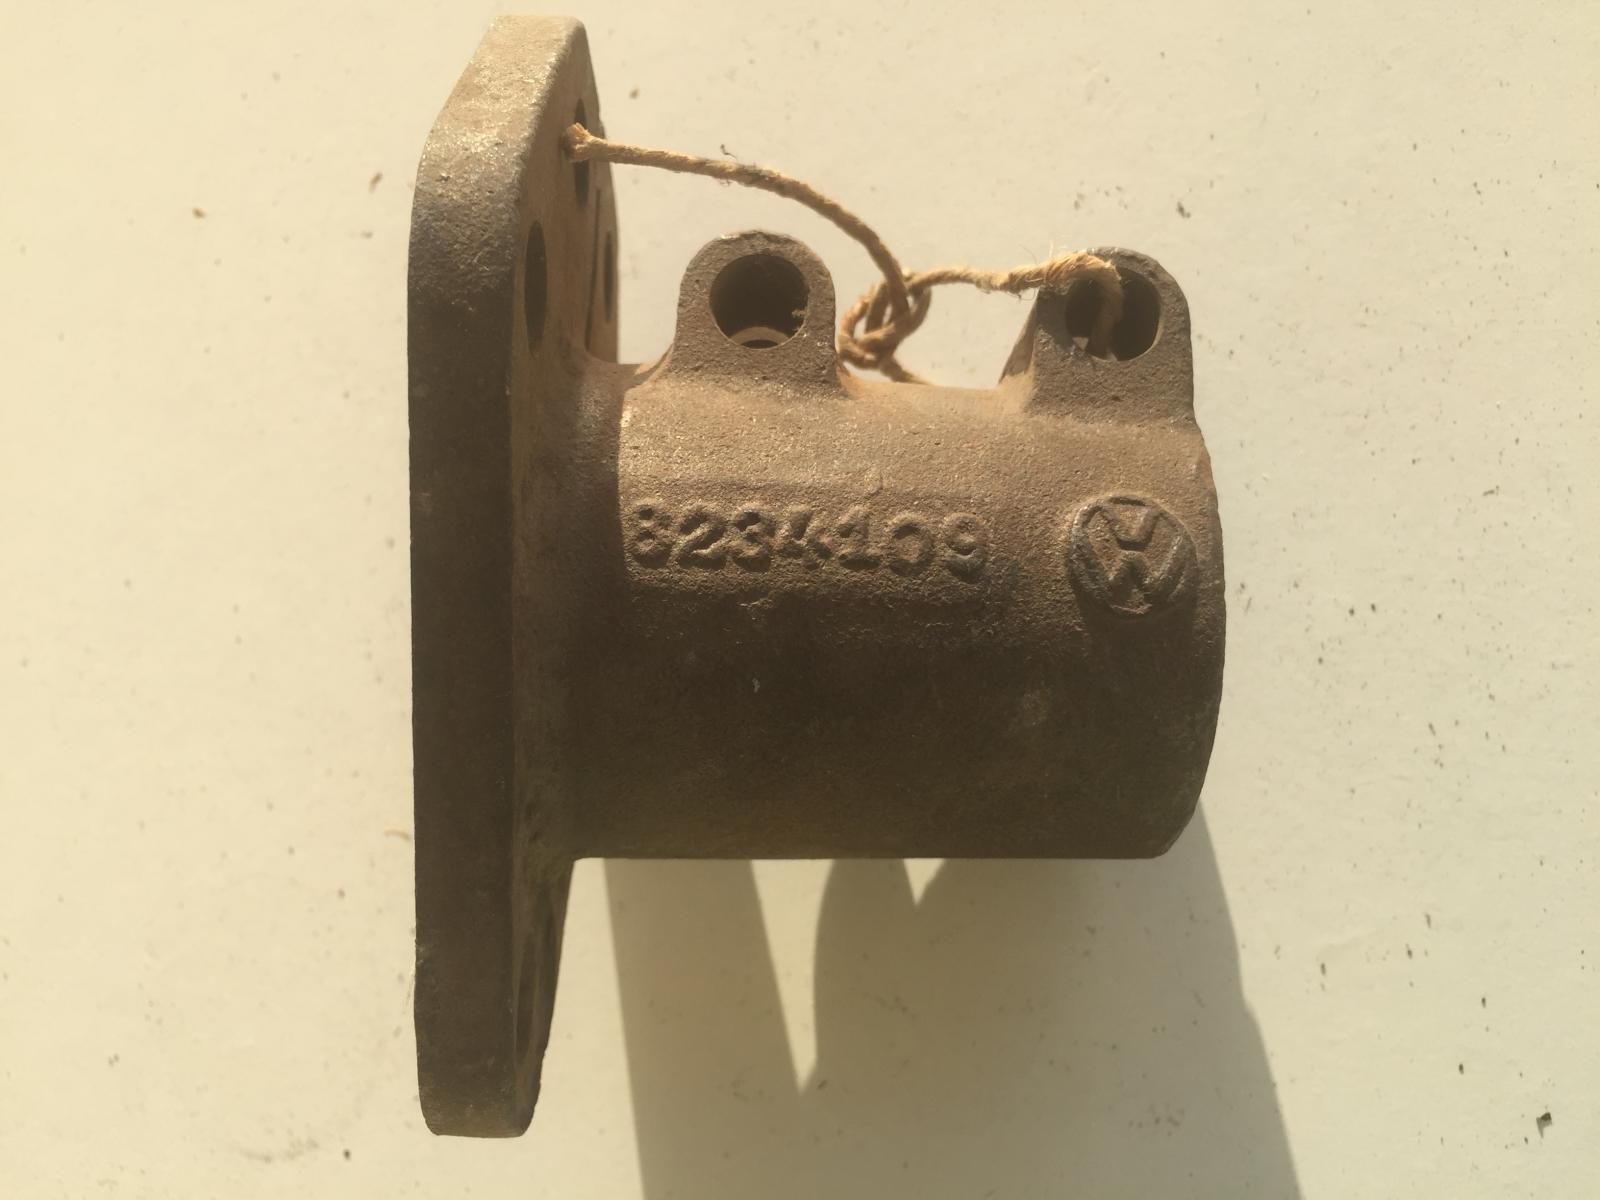 VW 8234109 part?